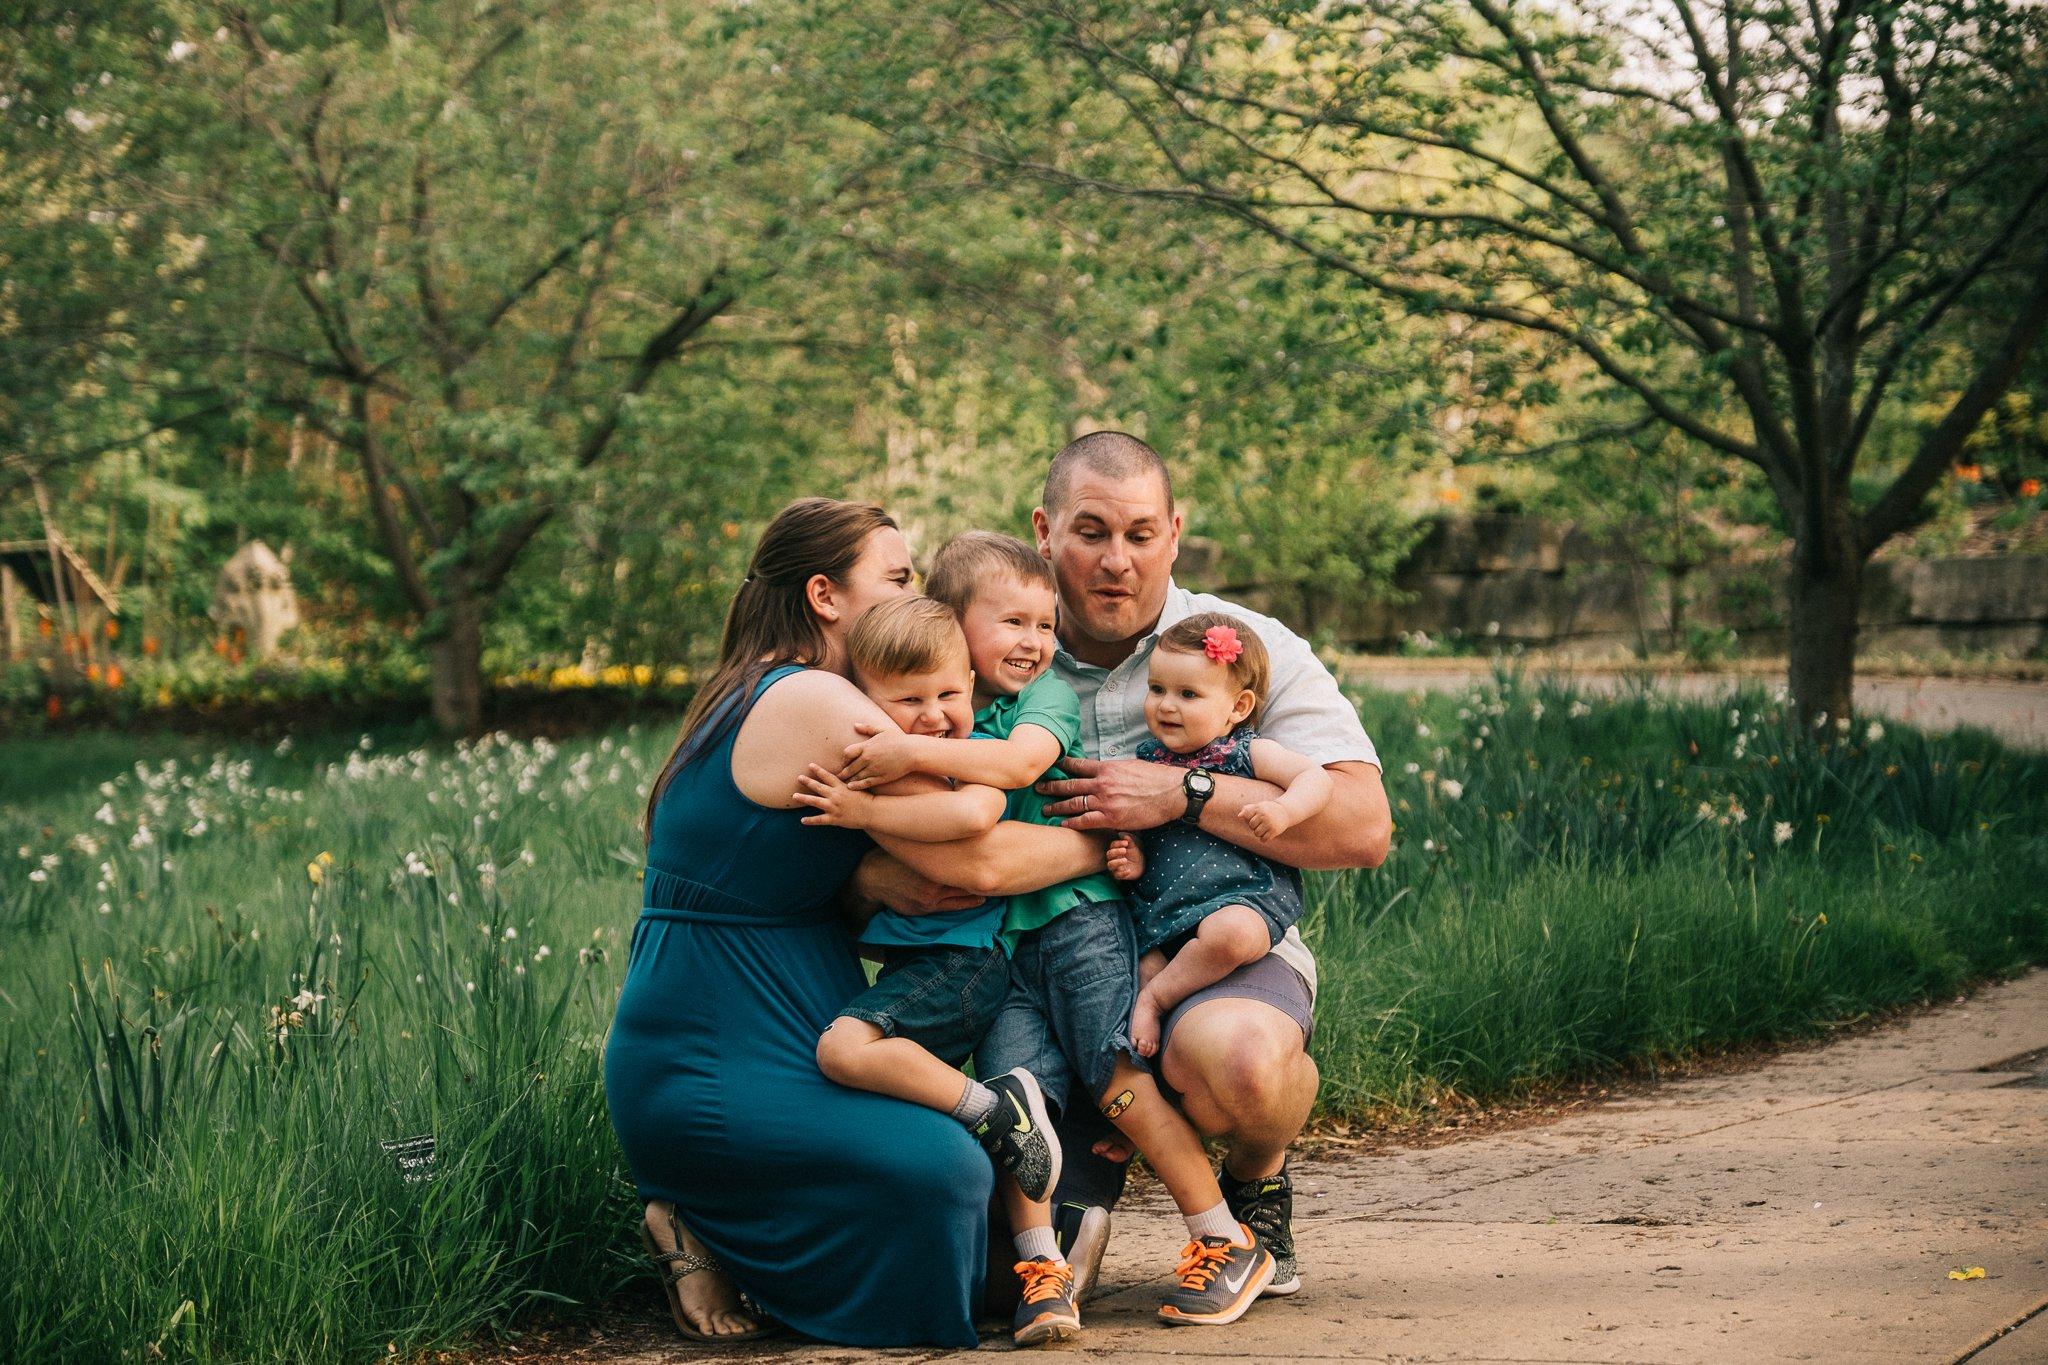 Olbrich Garden's Family Session